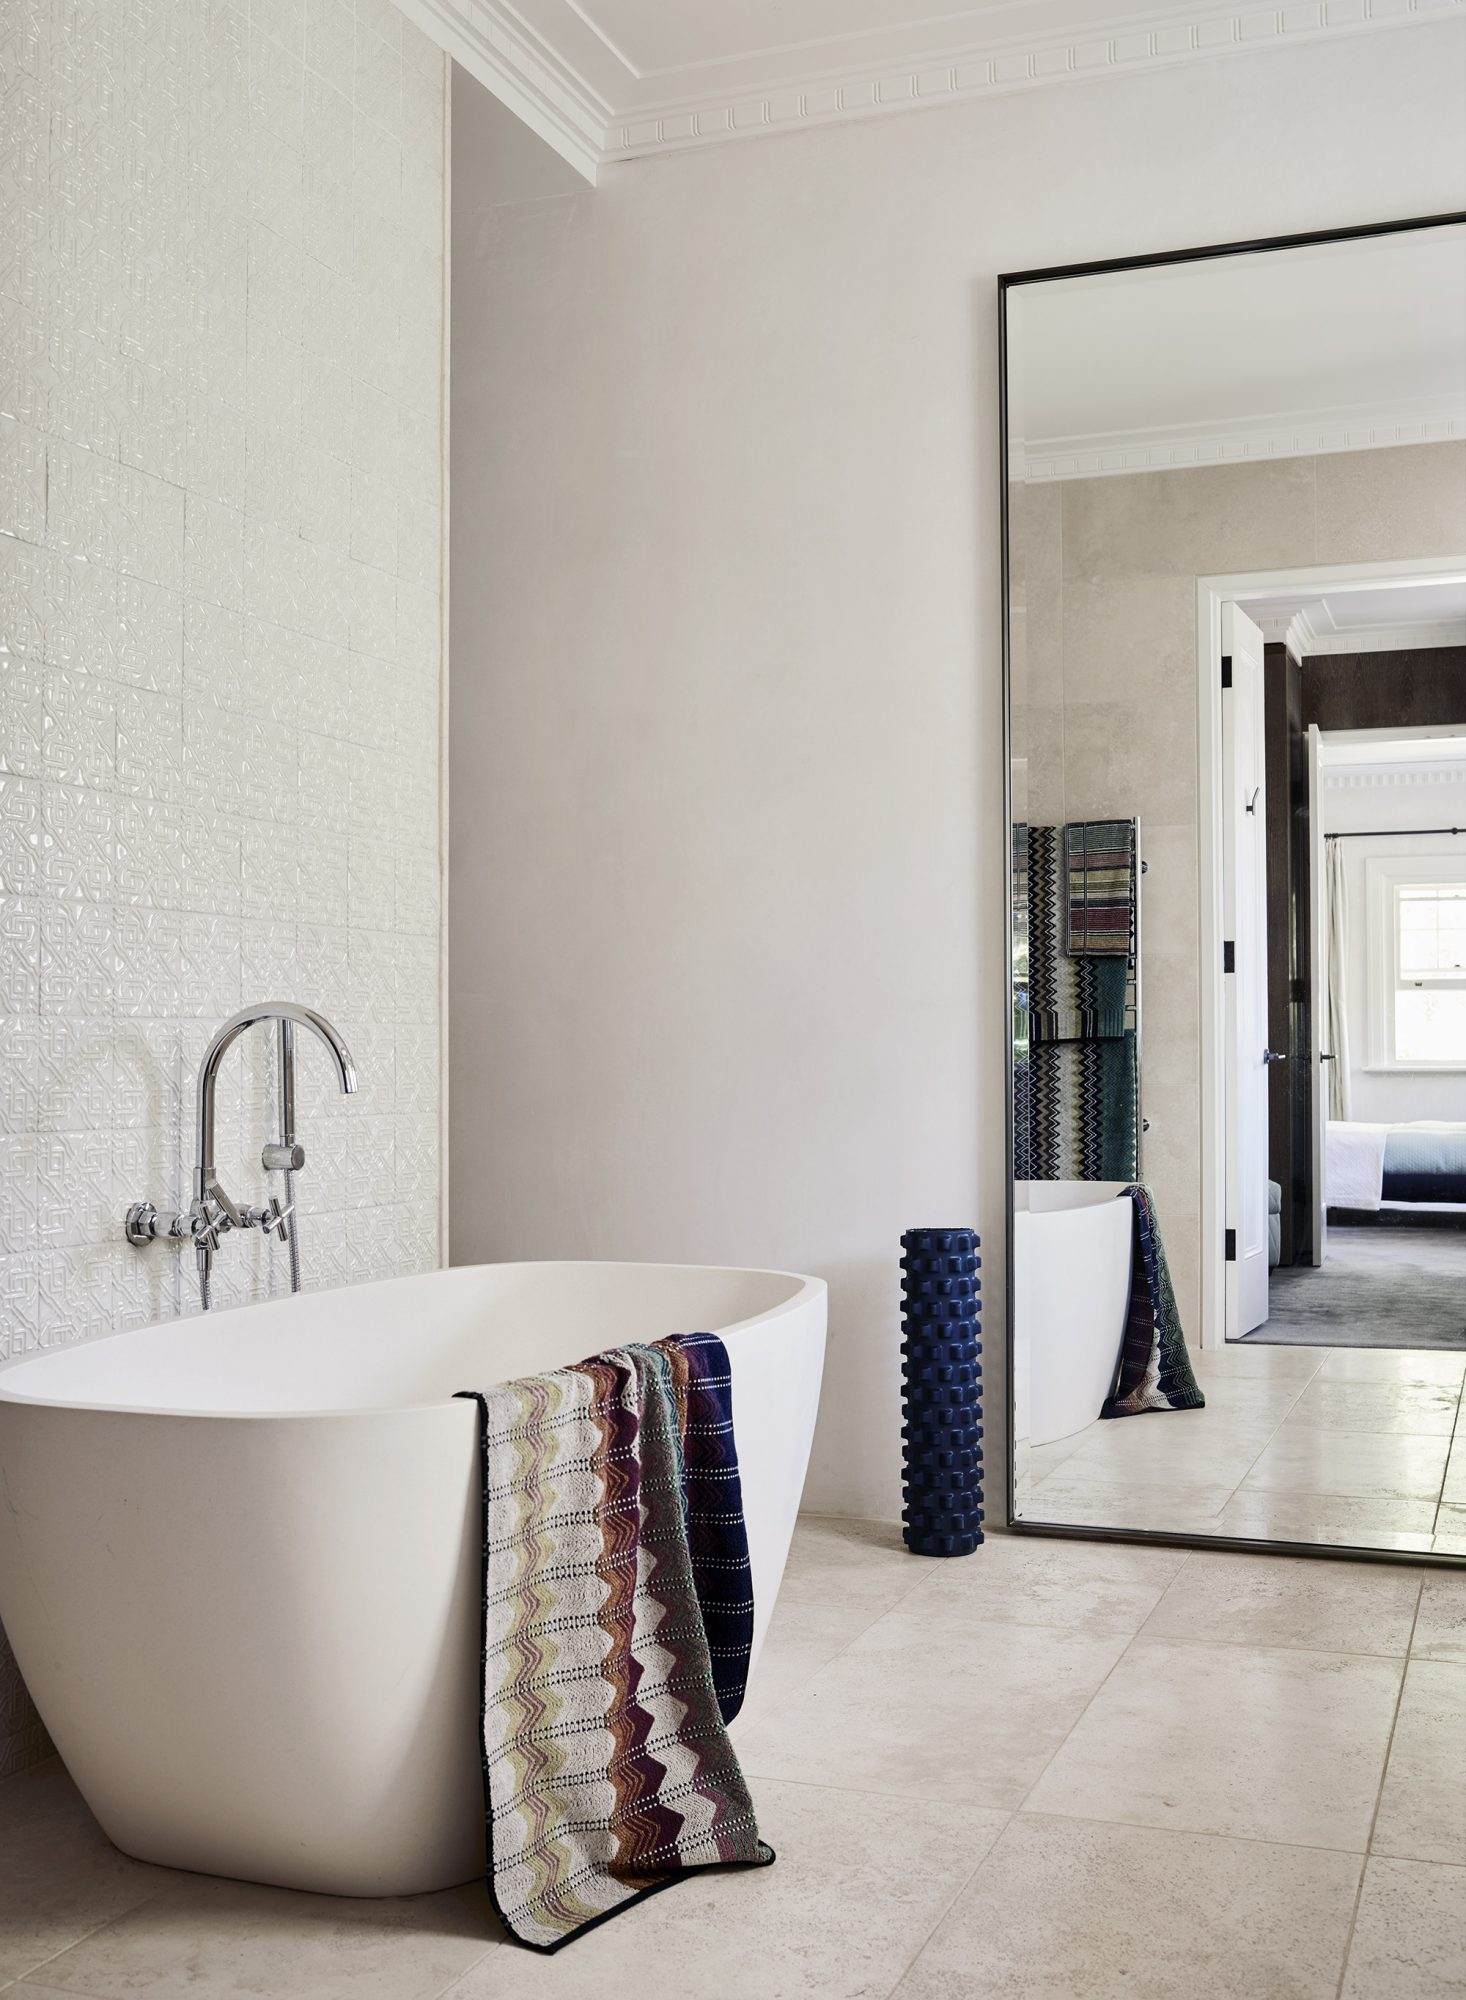 Luxury Bathroom Designer Melbourne - Modern Bathroom Designs & Ideas ...